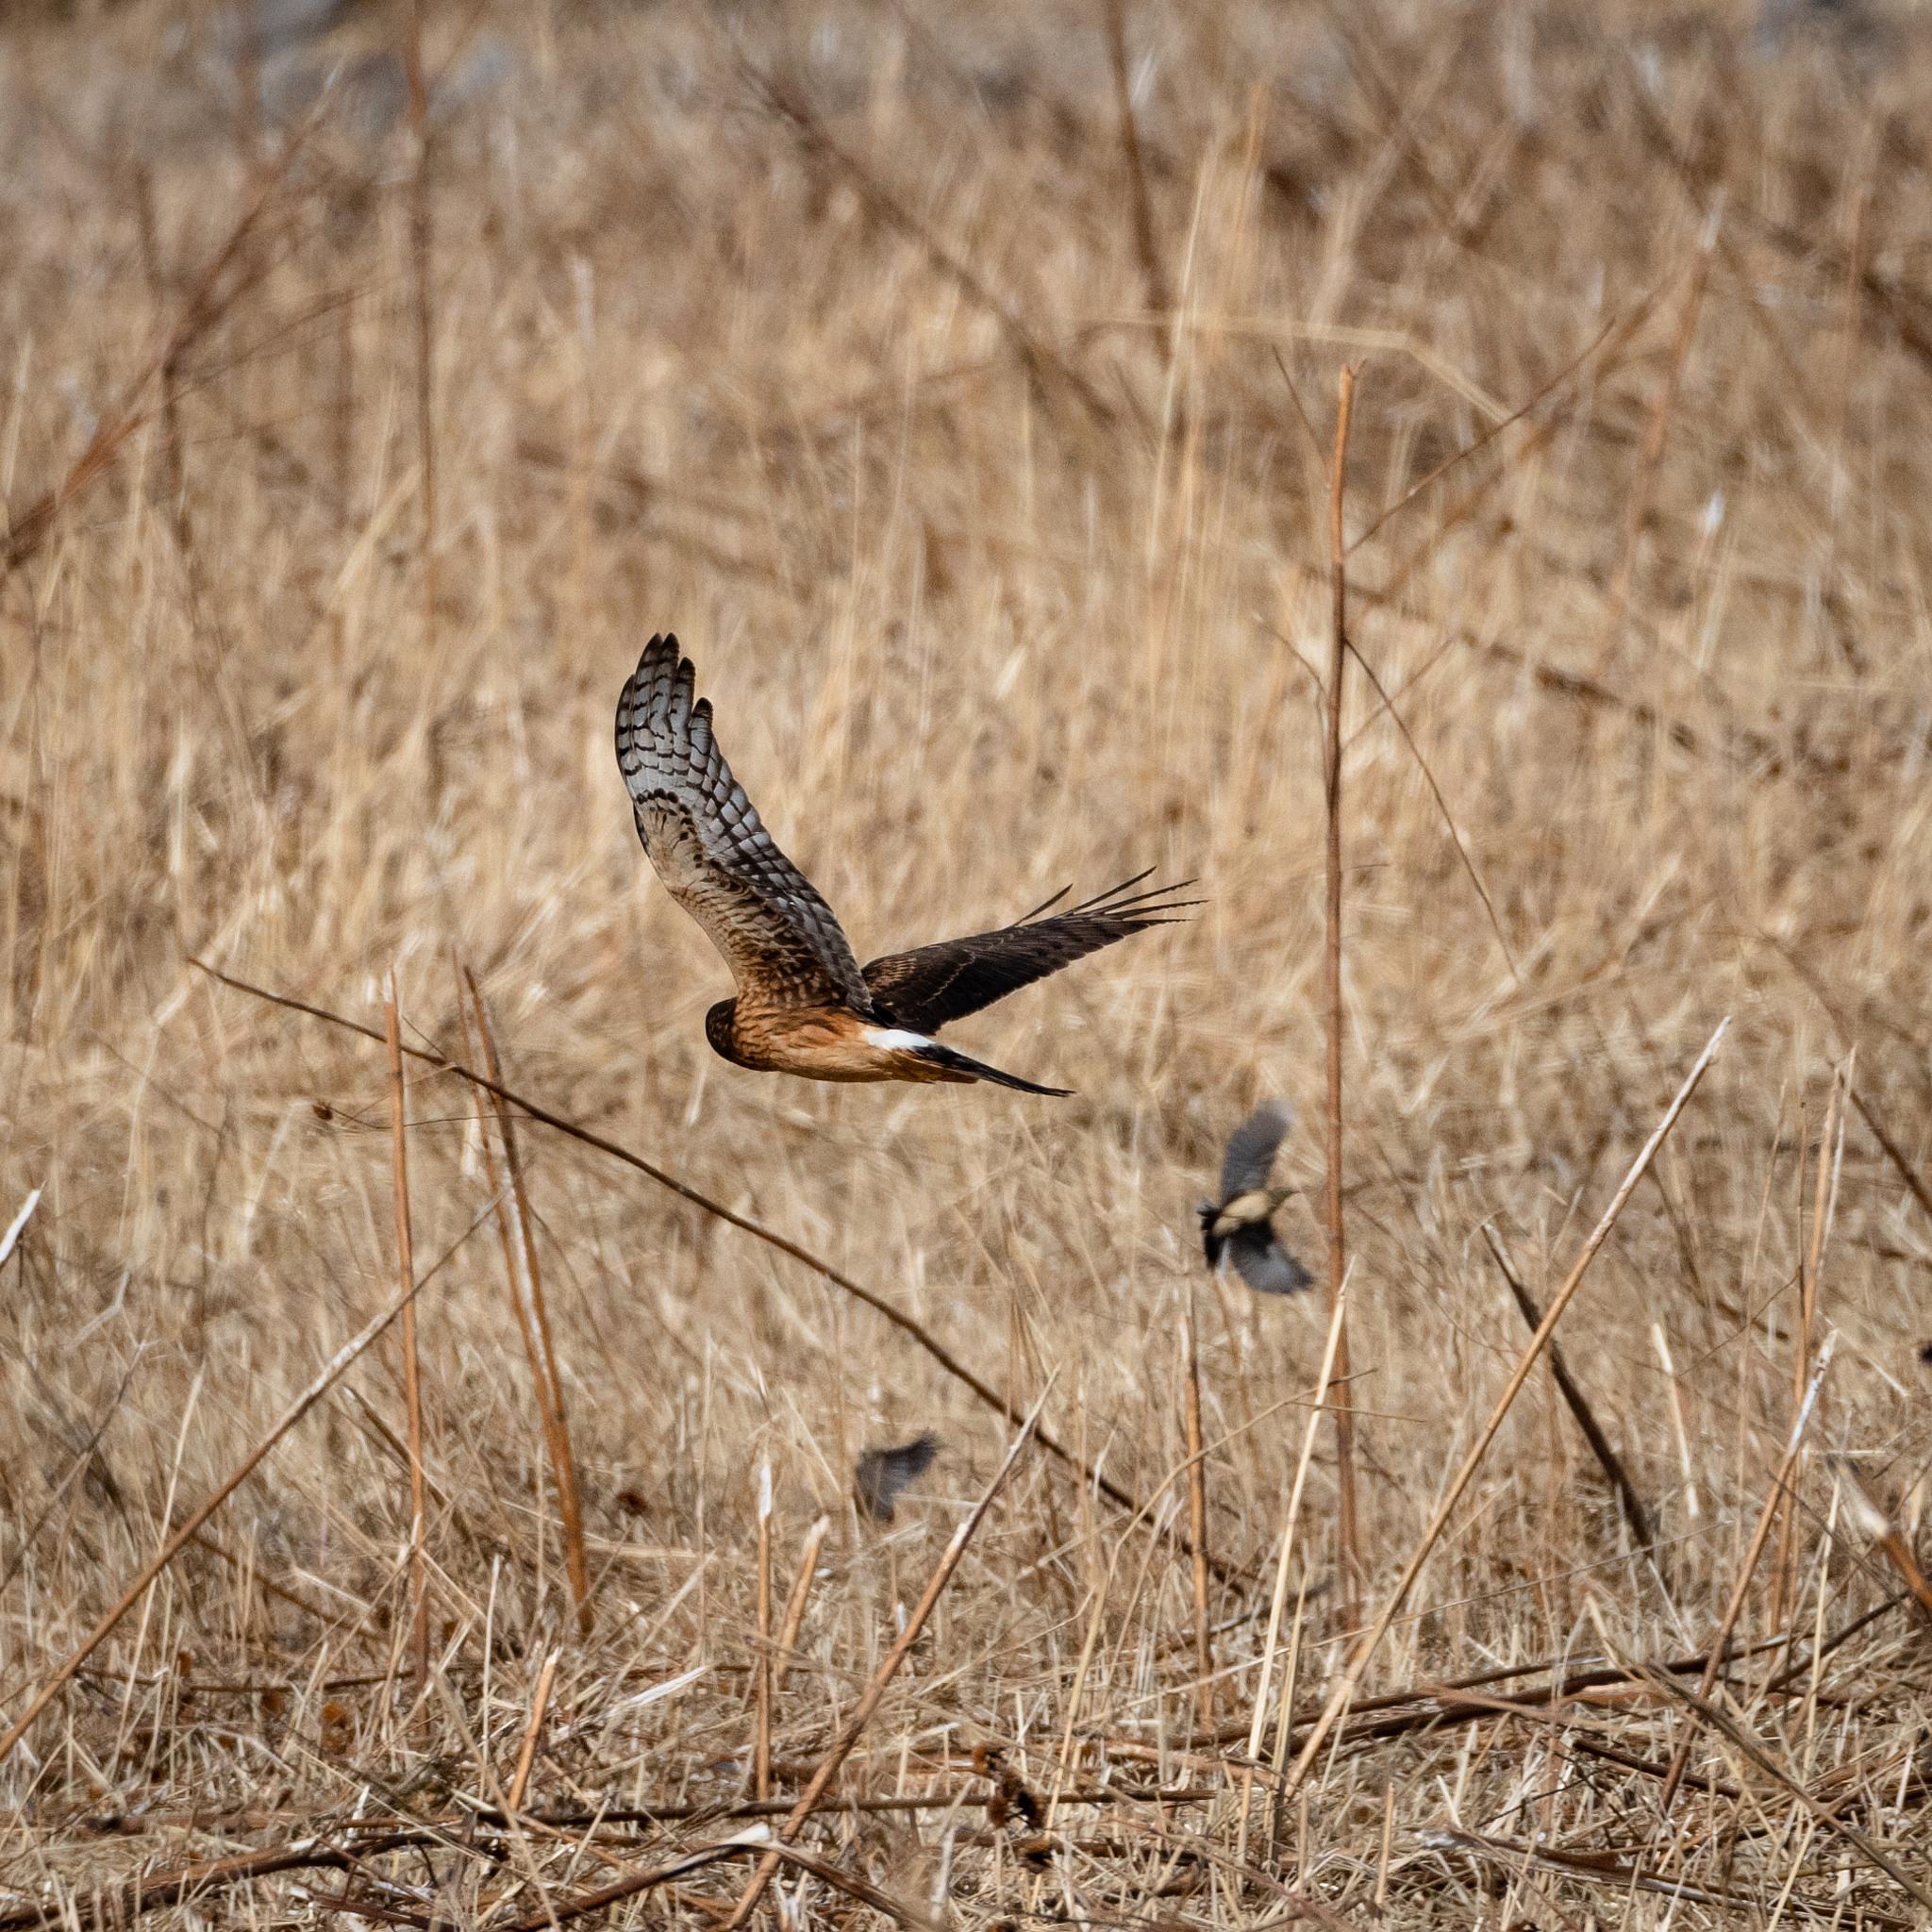 Northern Harrier Hawk and small bird